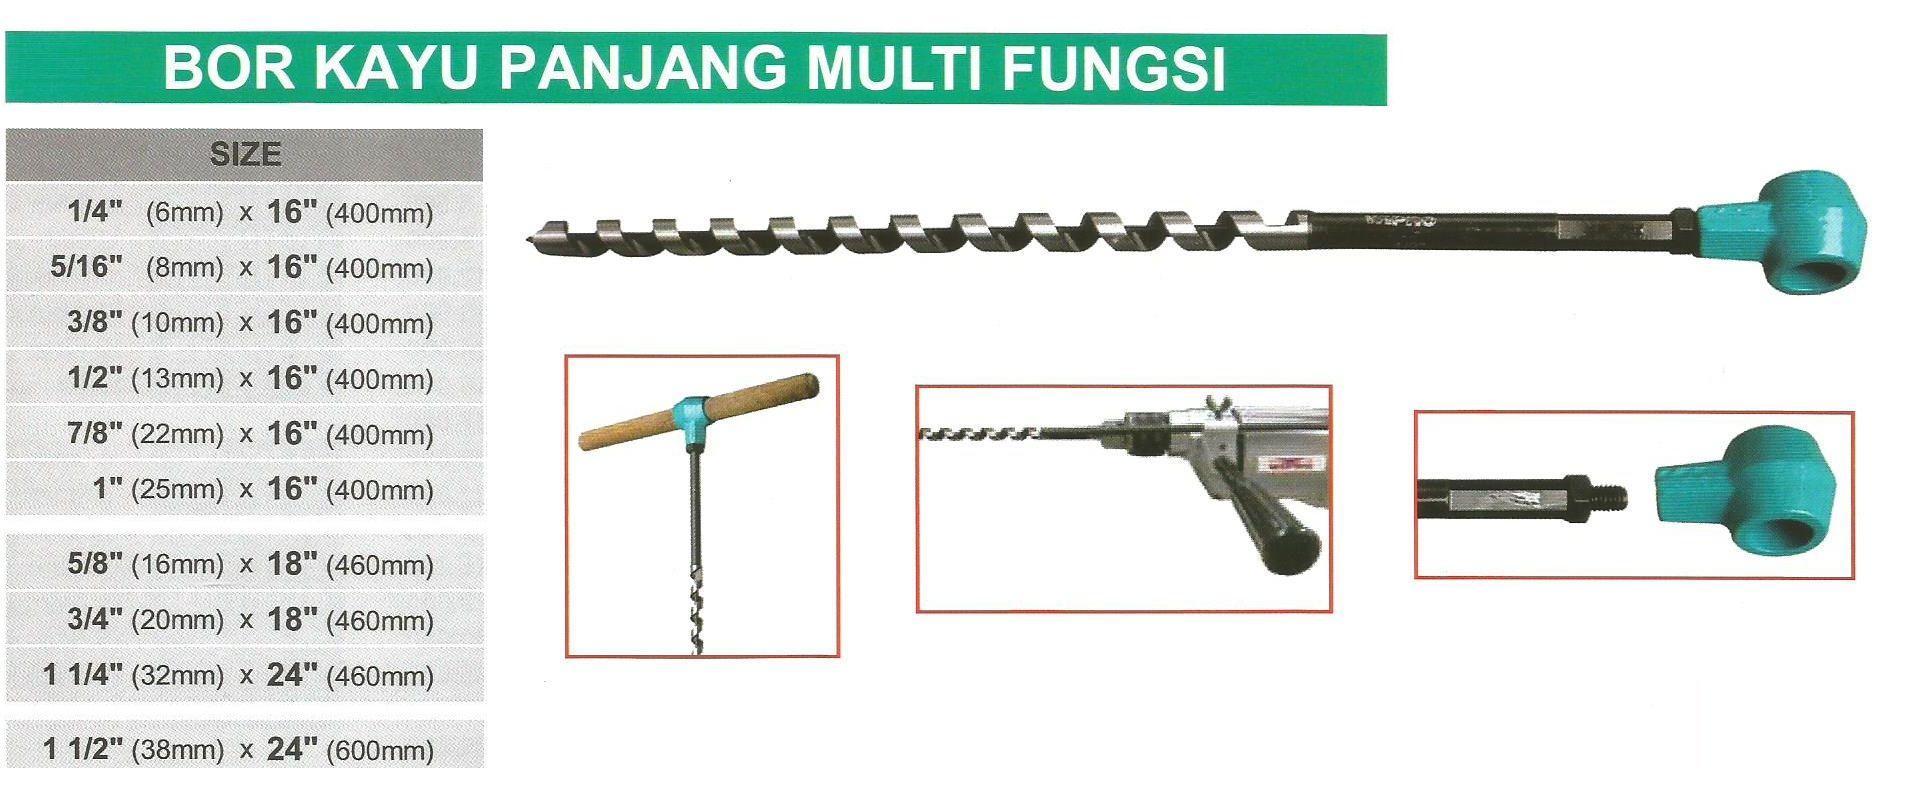 Bor Kayu Panjang Multi Fungsi Size 6 x 400 mm Wipro Ada